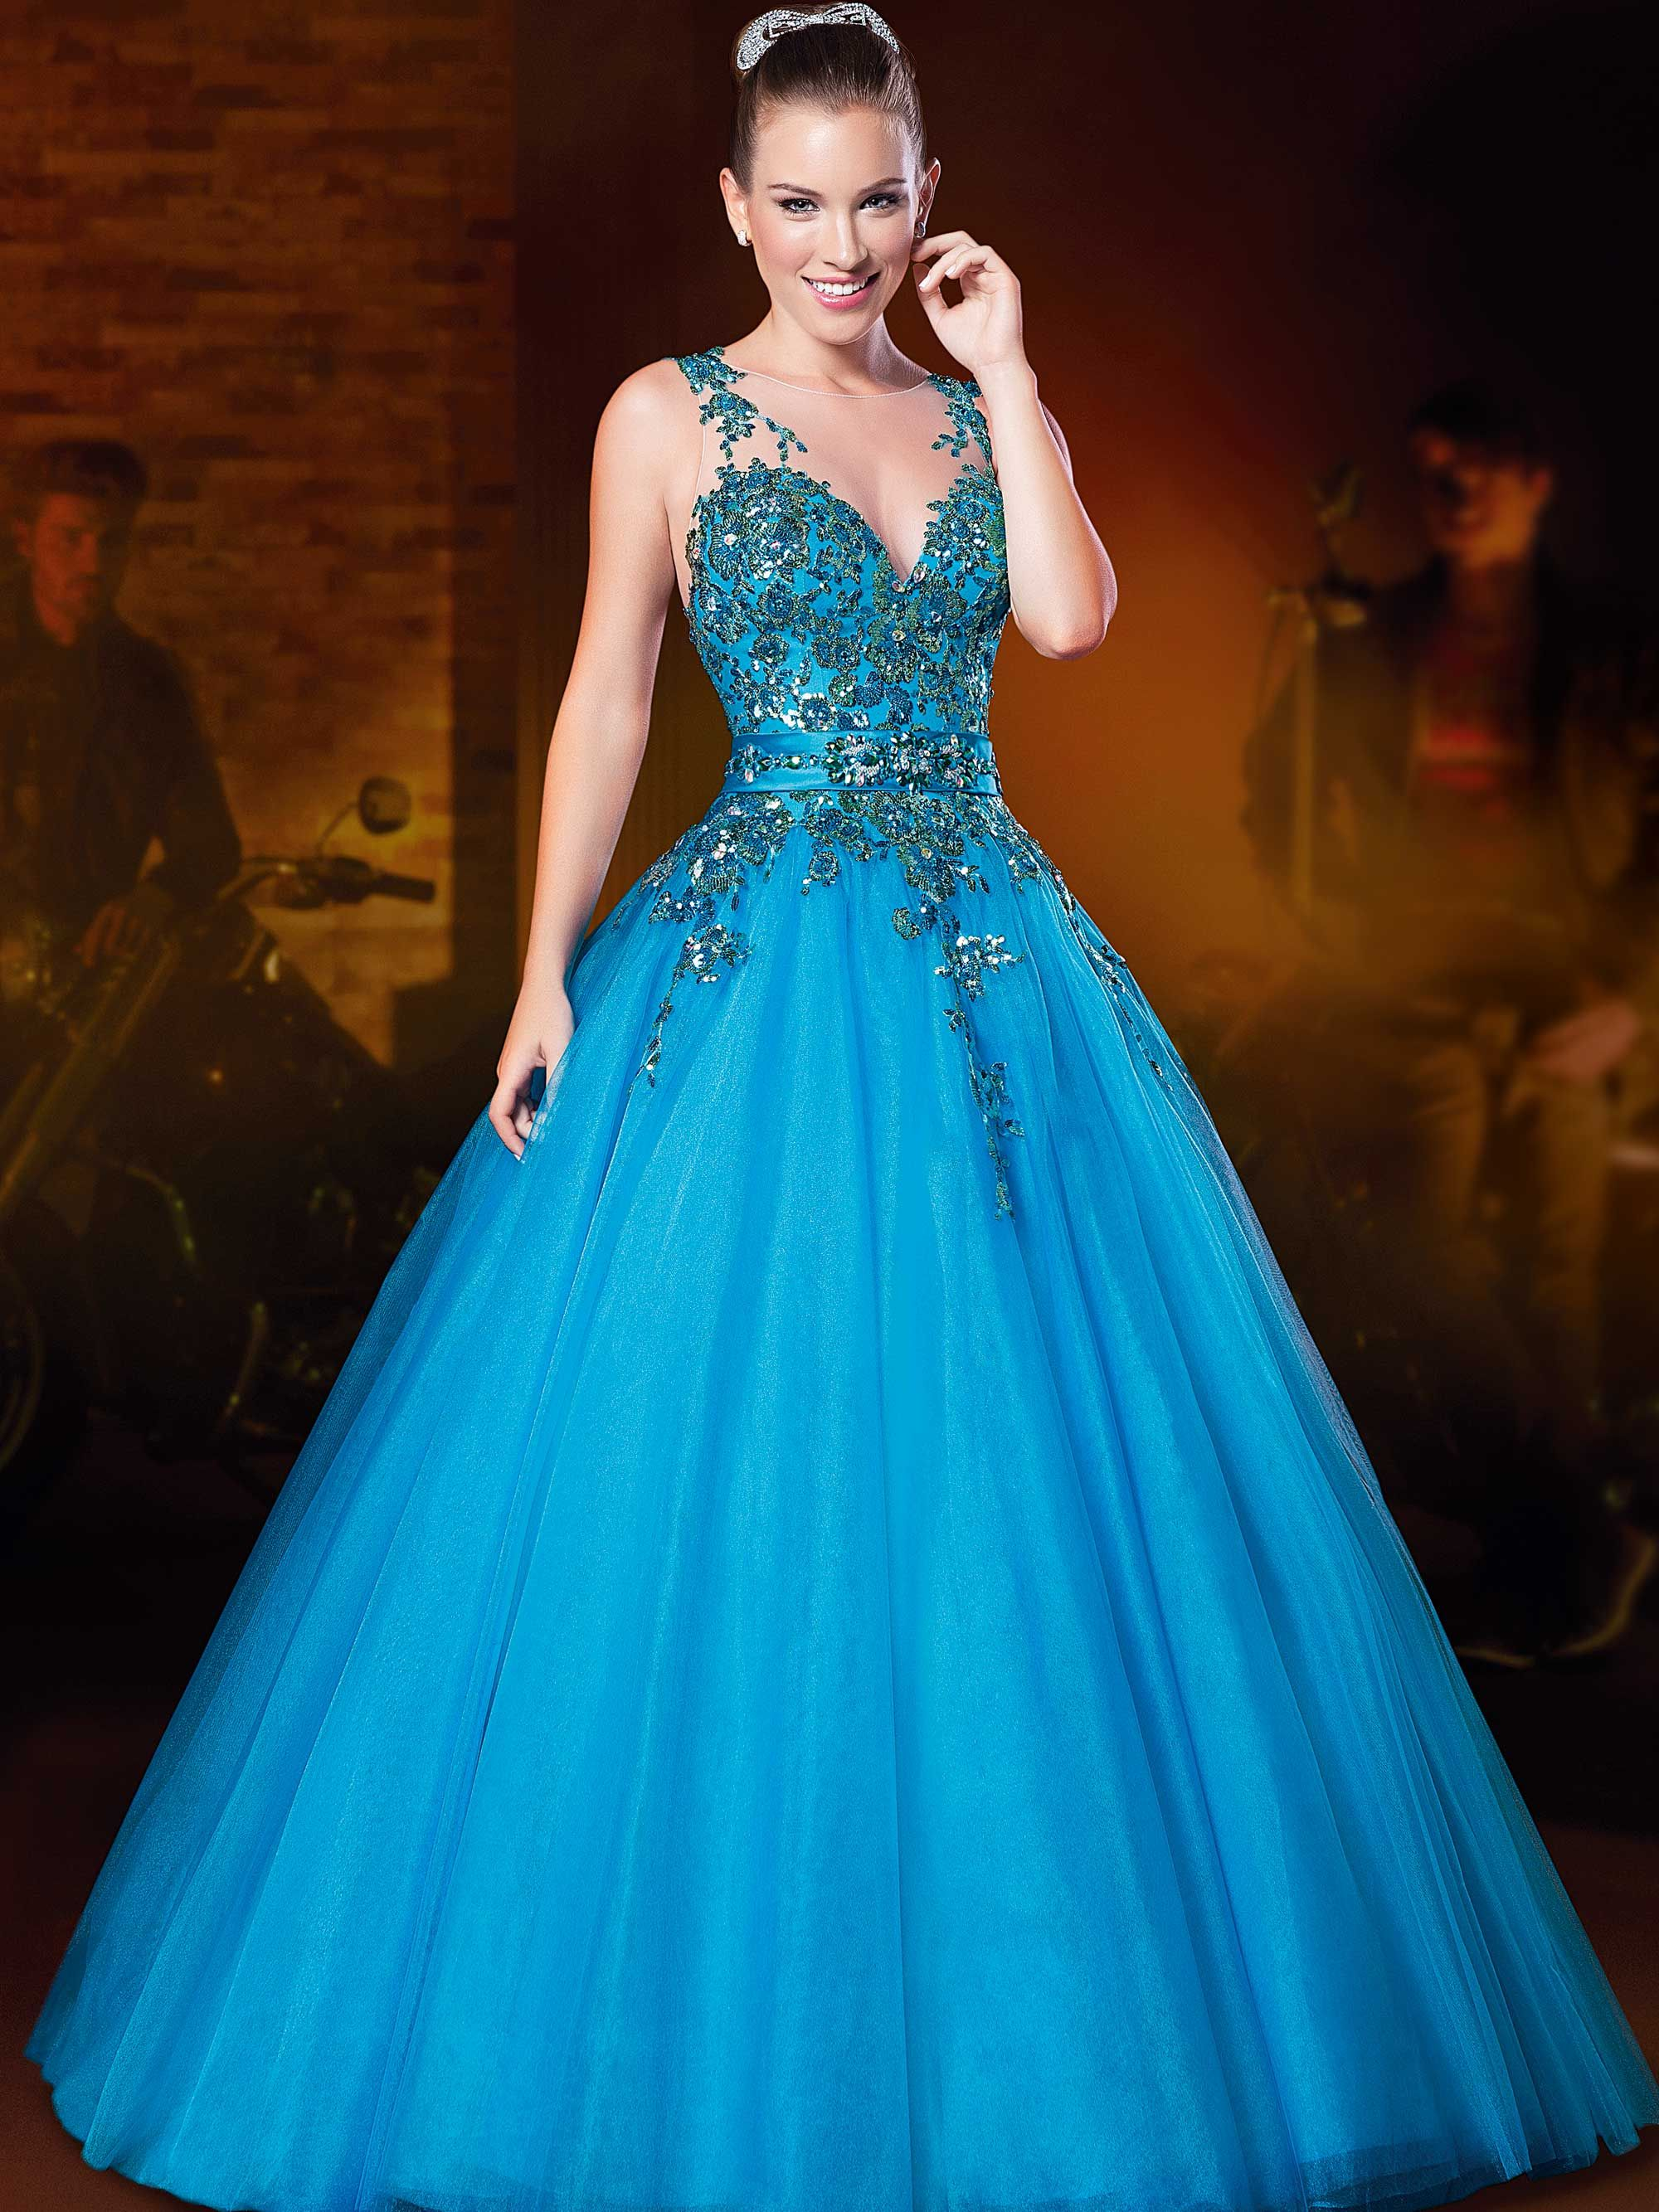 tumblr_m46t4eGrWp1r5pyhz | dresses | Pinterest | Debutante, Prom and ...